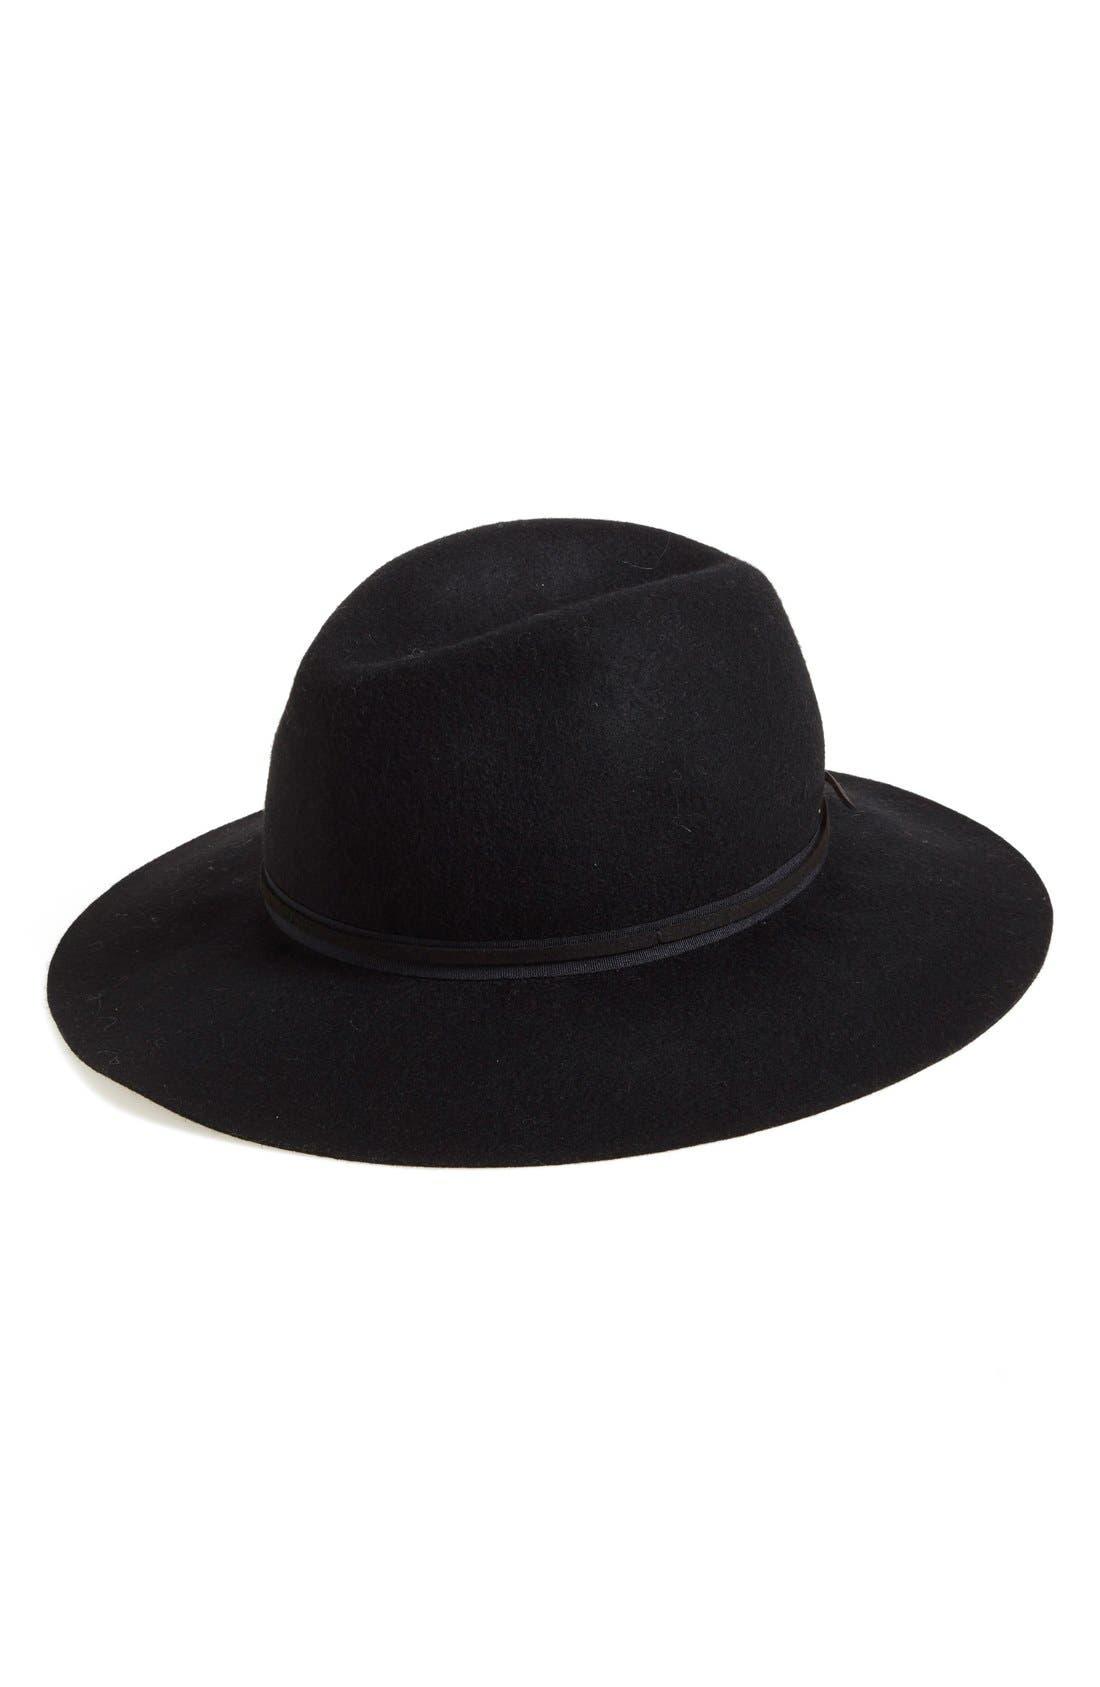 Main Image - Hinge Felted Wool Panama Hat